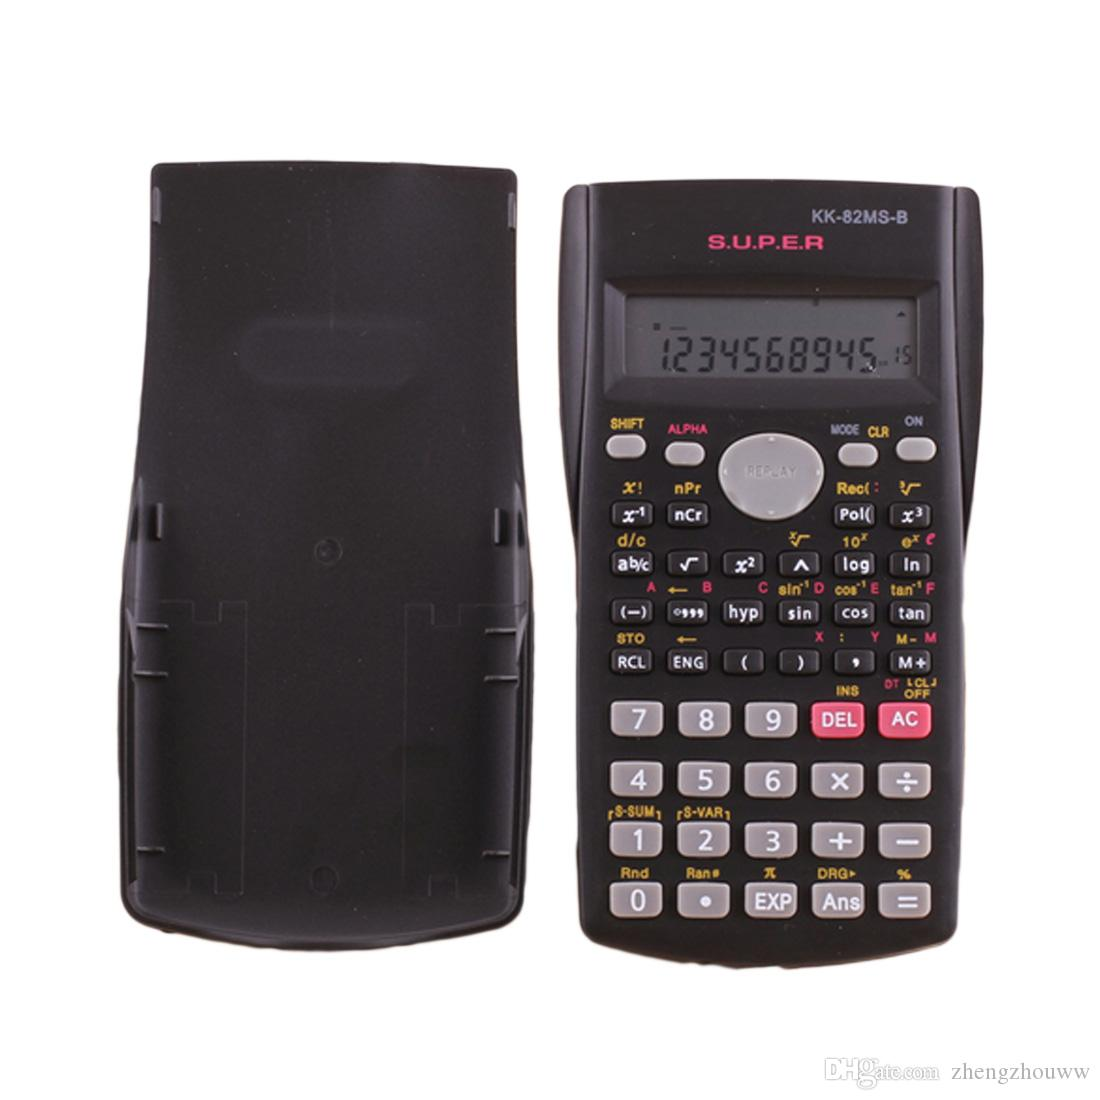 Handheld Student's Scientific Calculator 2 Line Display 82MS-B Portable Multifunctional Calculator for Mathematics Teaching